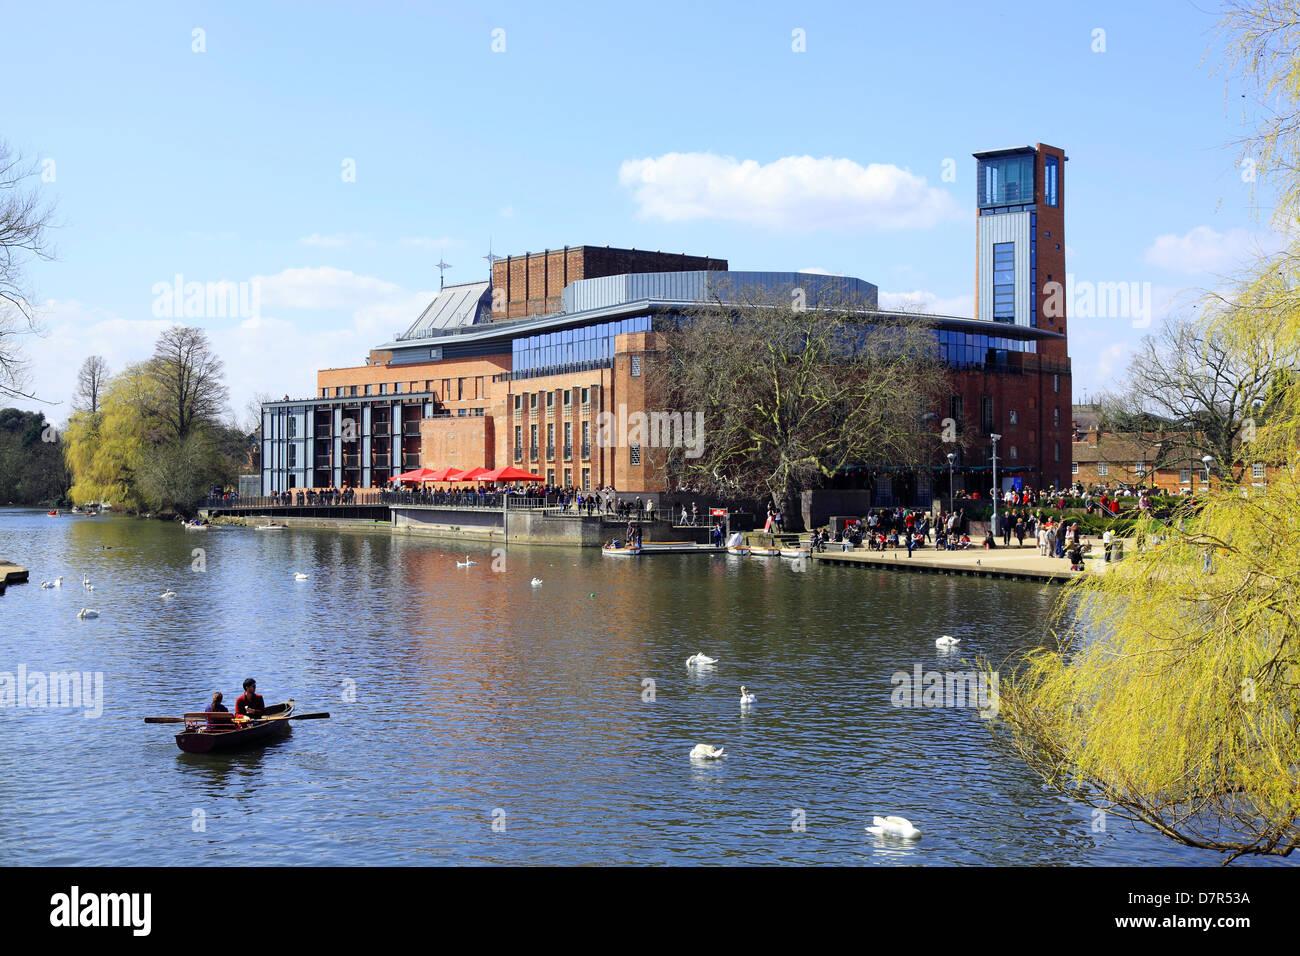 Royal Shakespeare Company teatro a Stratford on Avon in Inghilterra. Immagini Stock